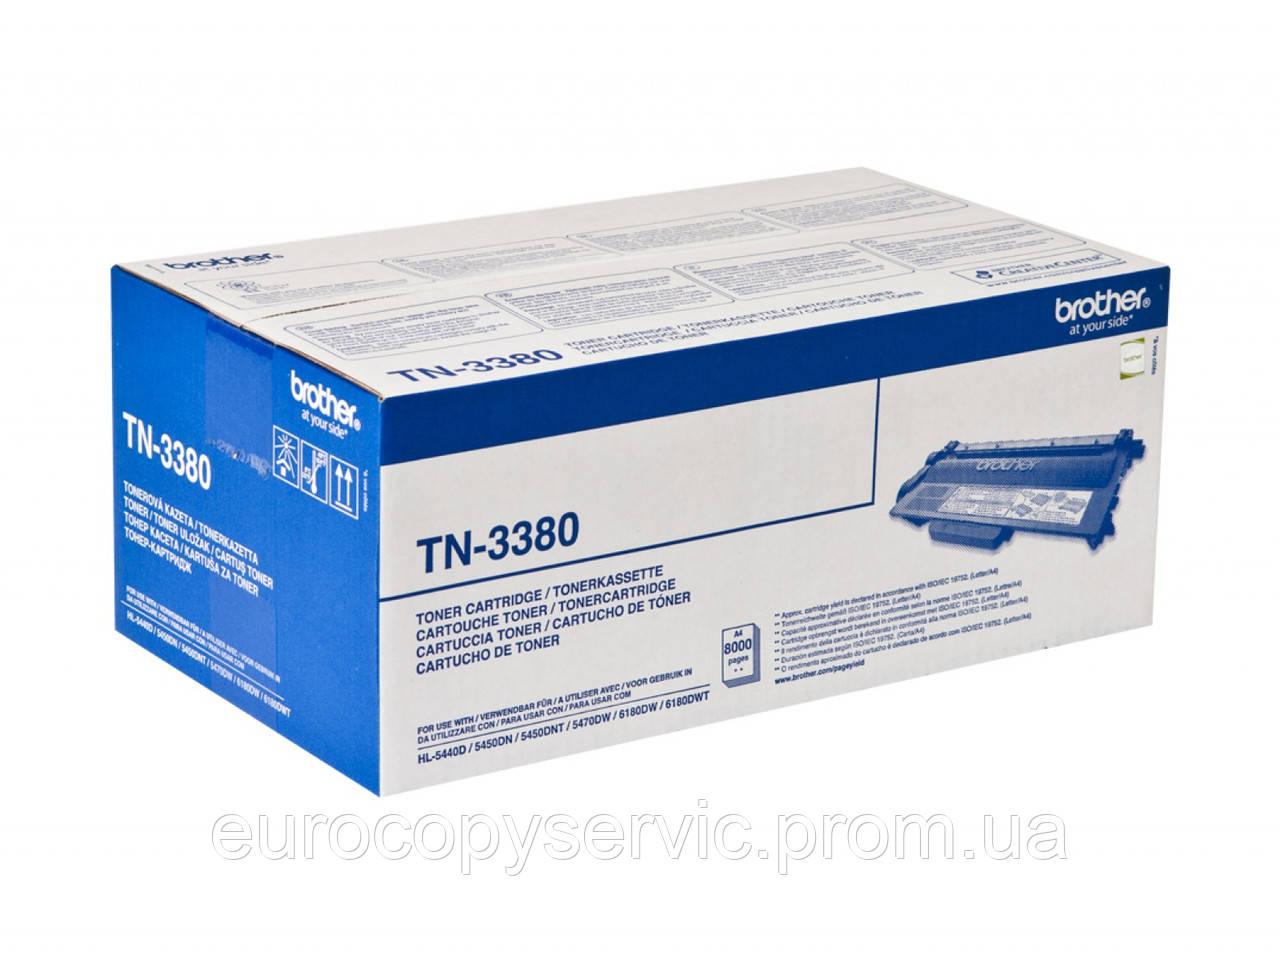 Тонер-картридж Brother HL-5440/5450/6180/DCP-8110/8250/MFC-8520/8950 ресурс 8 000 стор@5% (А4) (TN3380)